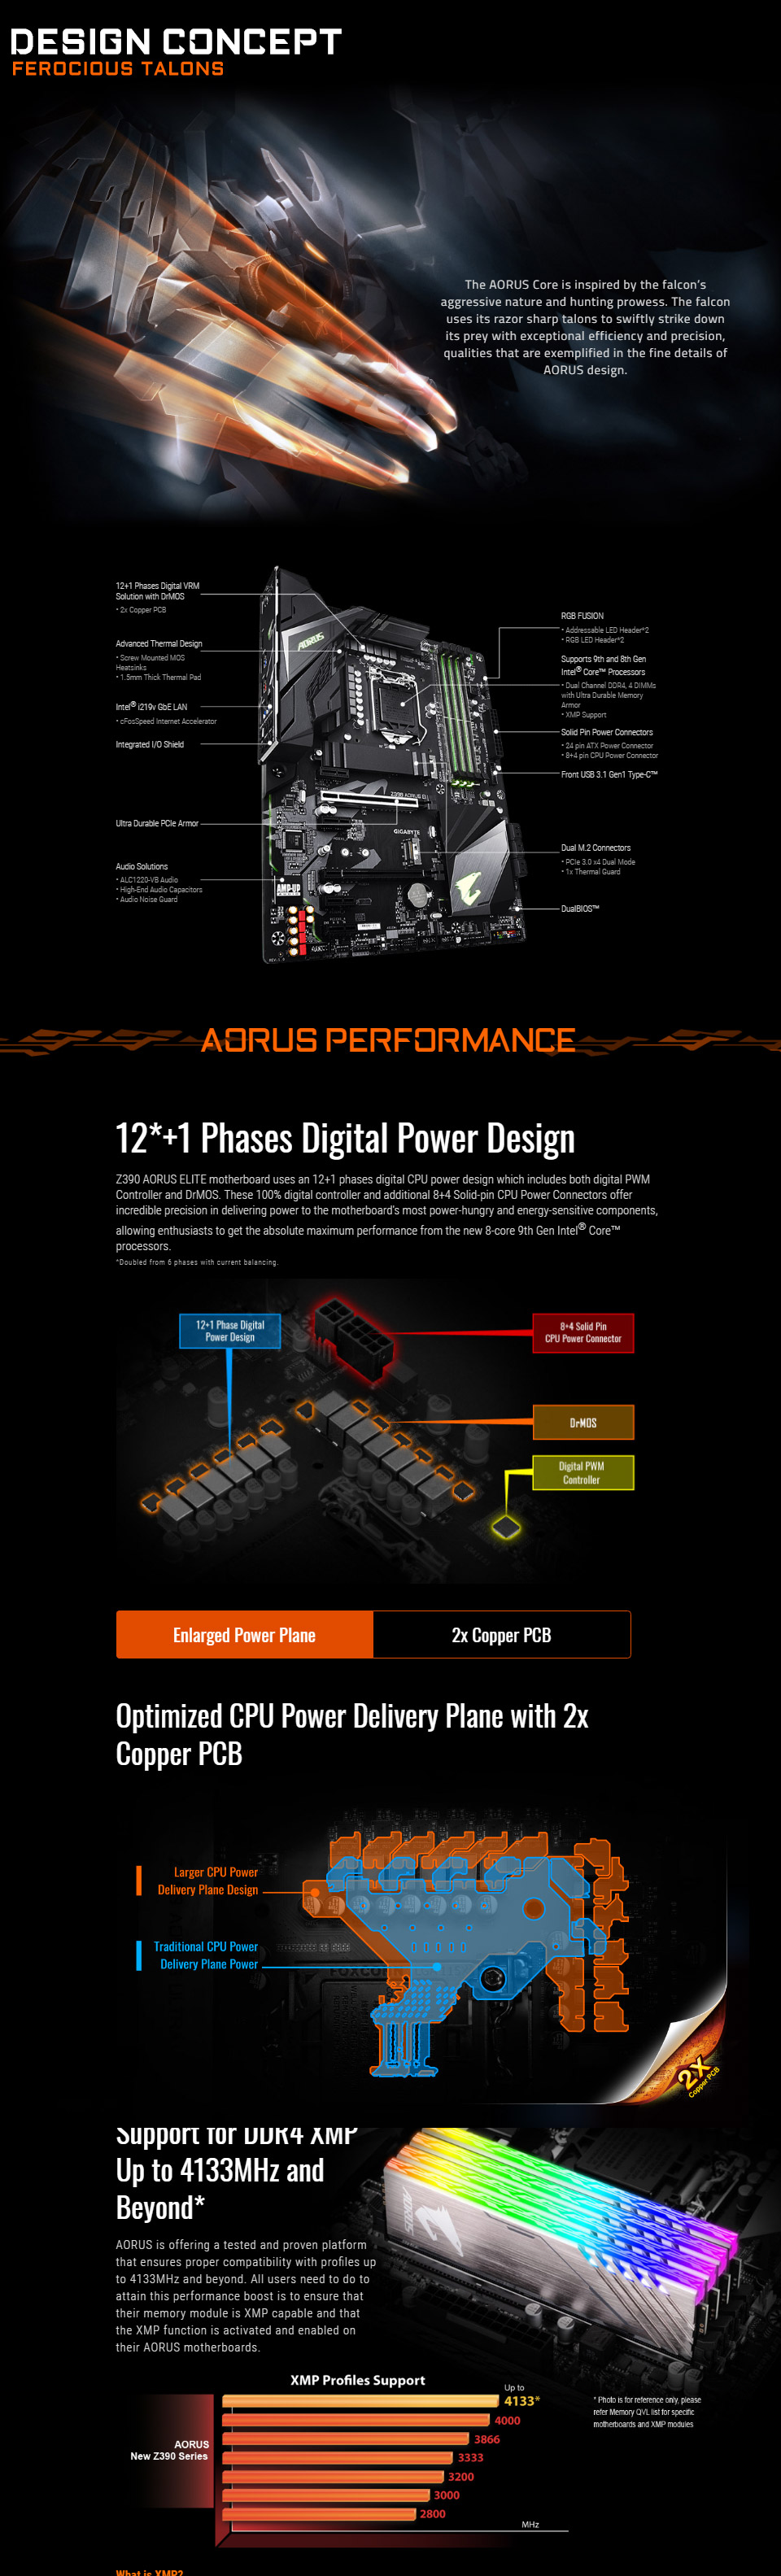 Gigabyte Z390 Aorus Elite Gaming Motherboard